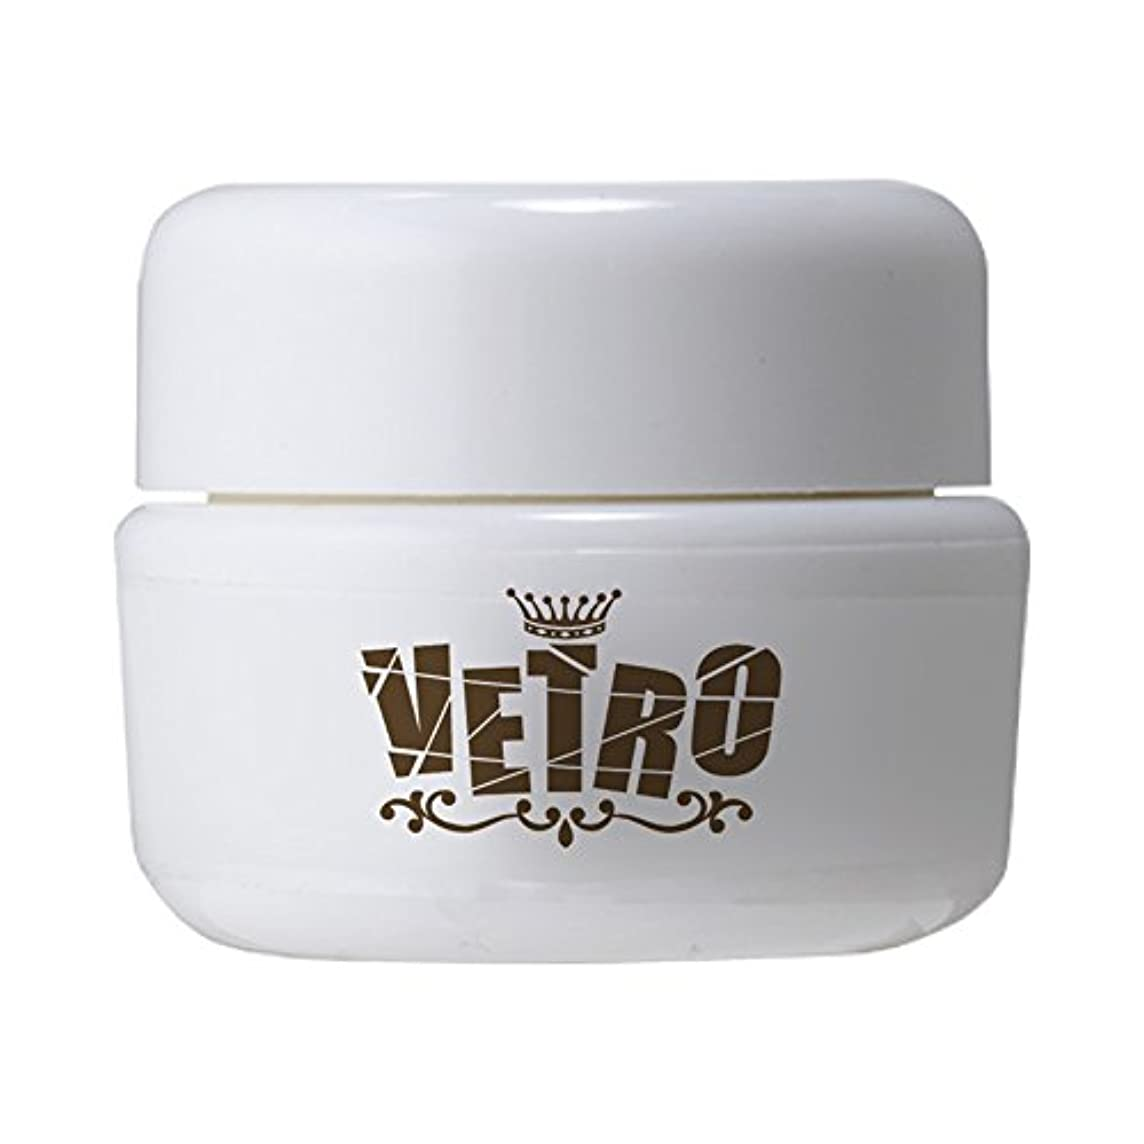 VETRO No.19 カラージェル マット VL372 チトセ 4ml